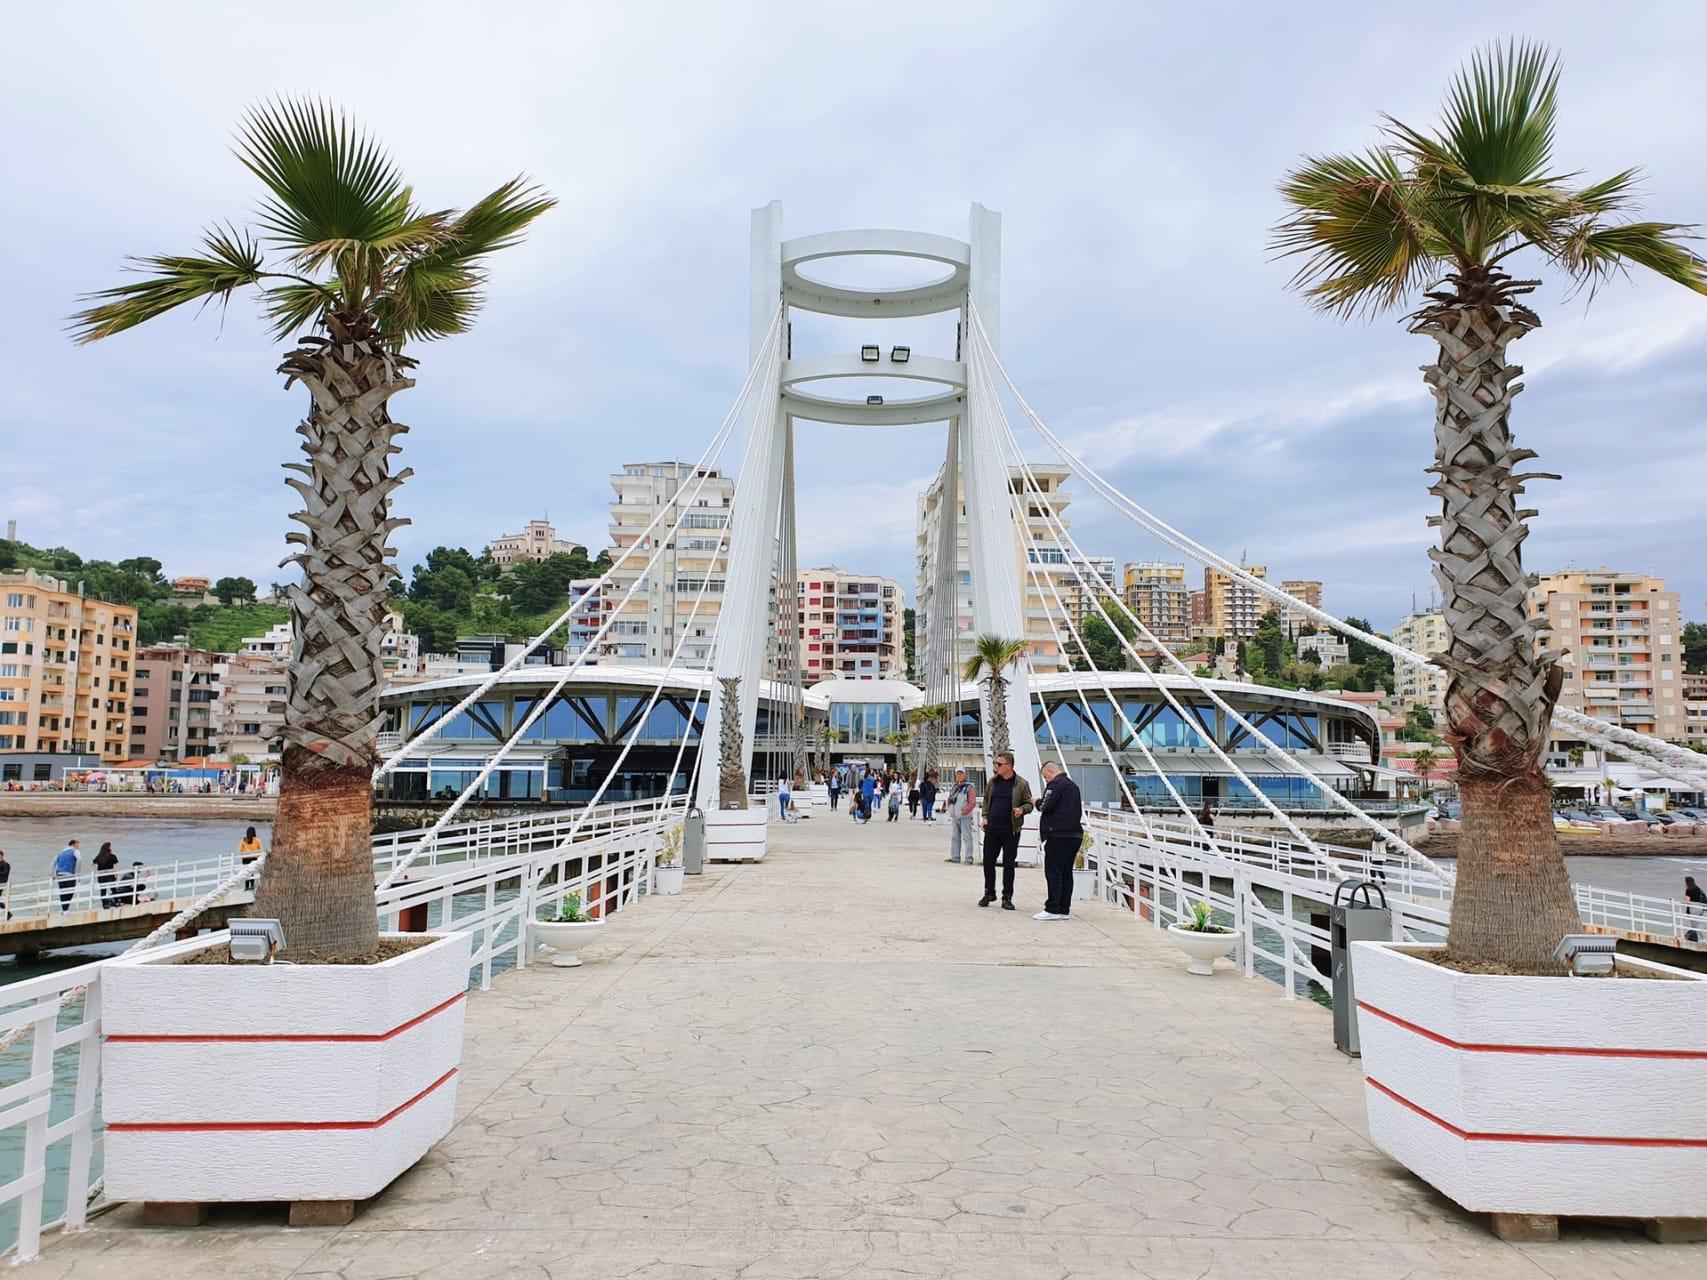 Durrës - Roman Amphitheatre , Venetian Tower, Vollga Promenade and city center.